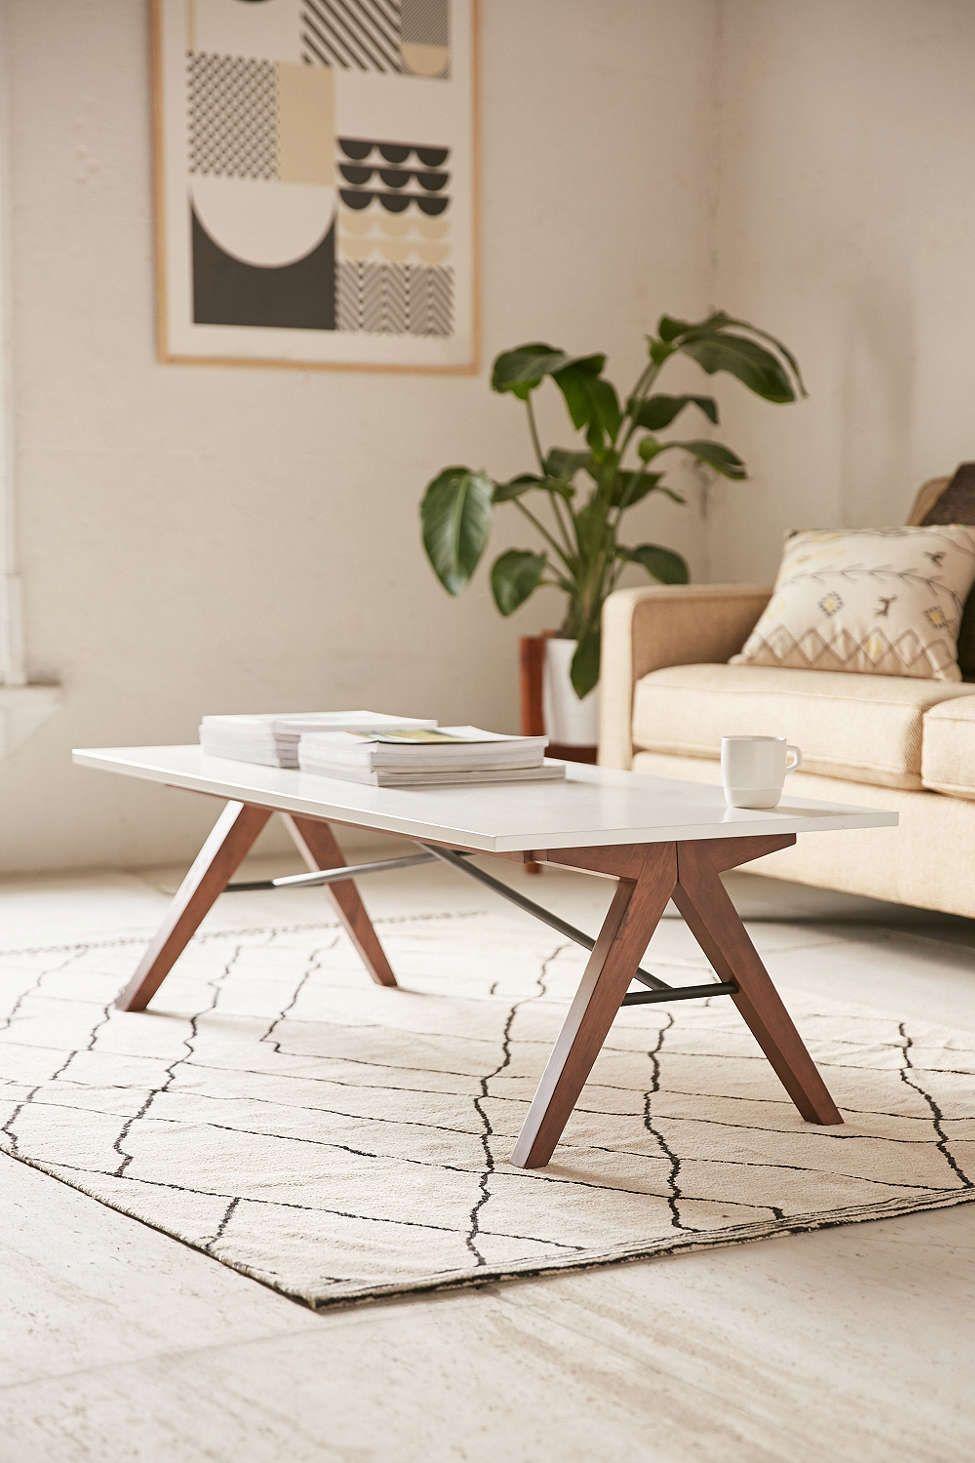 Saints Coffee Table Coffee Table Urban Outfitters Coffee Table Mid Century Modern Coffee Table [ 1463 x 975 Pixel ]